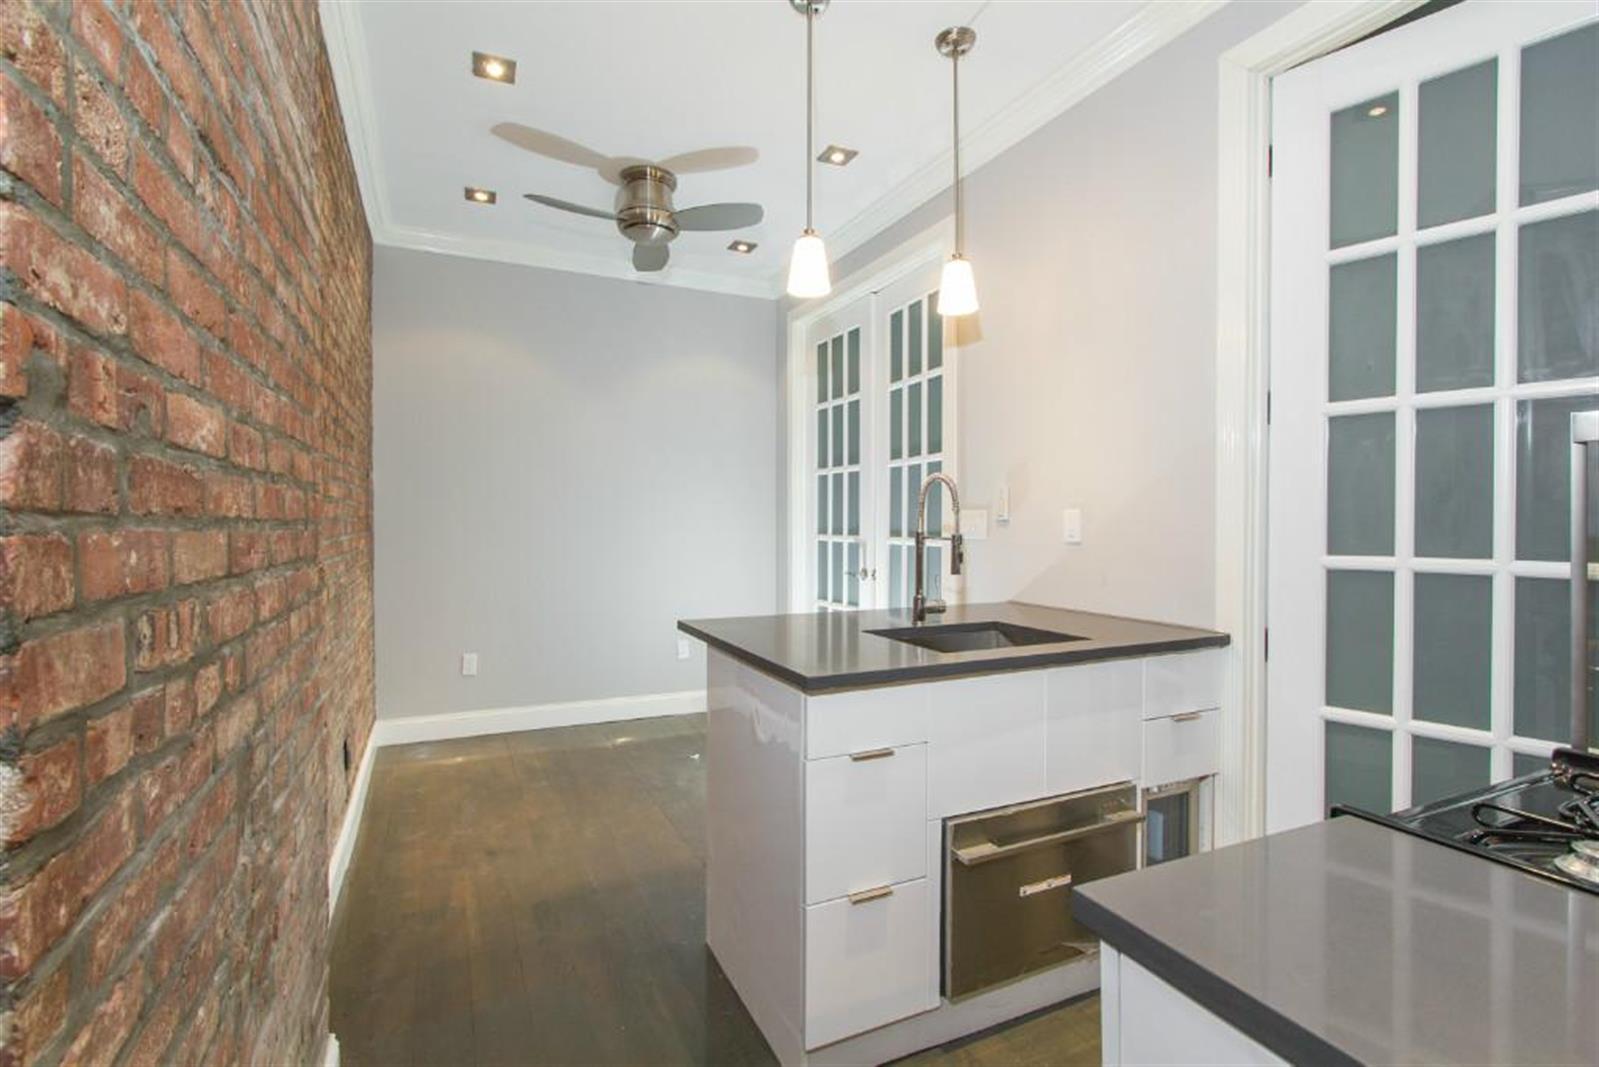 2 beautiful bedroom apartment - East Harlem